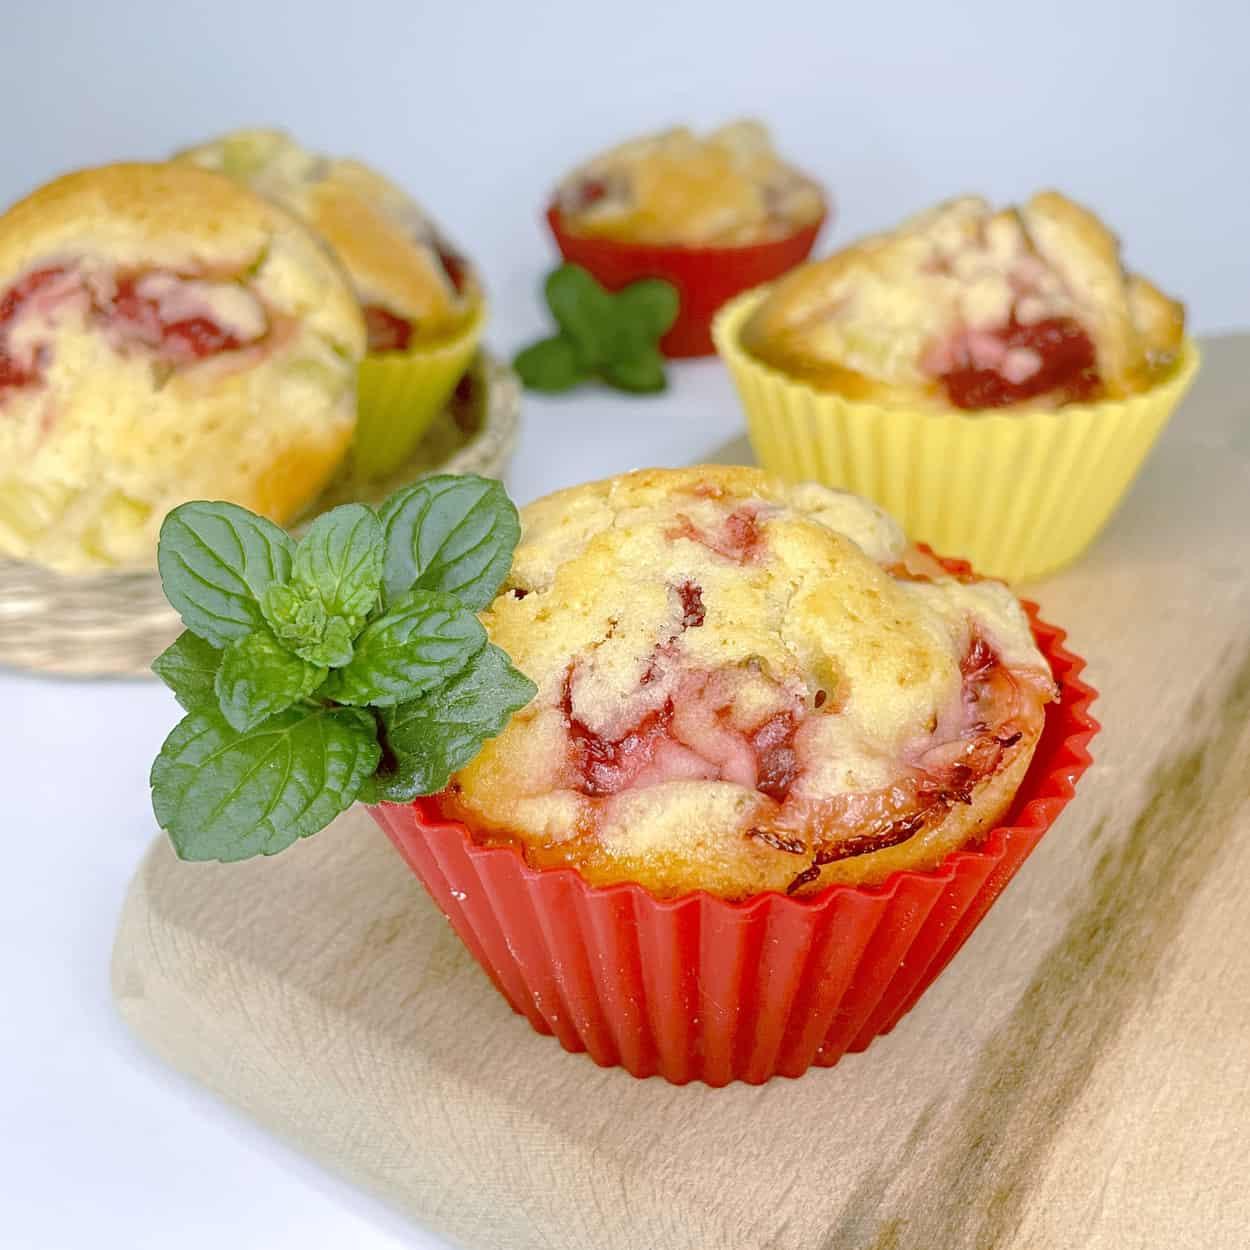 muffiny-s-jahodami-a-rebarborou